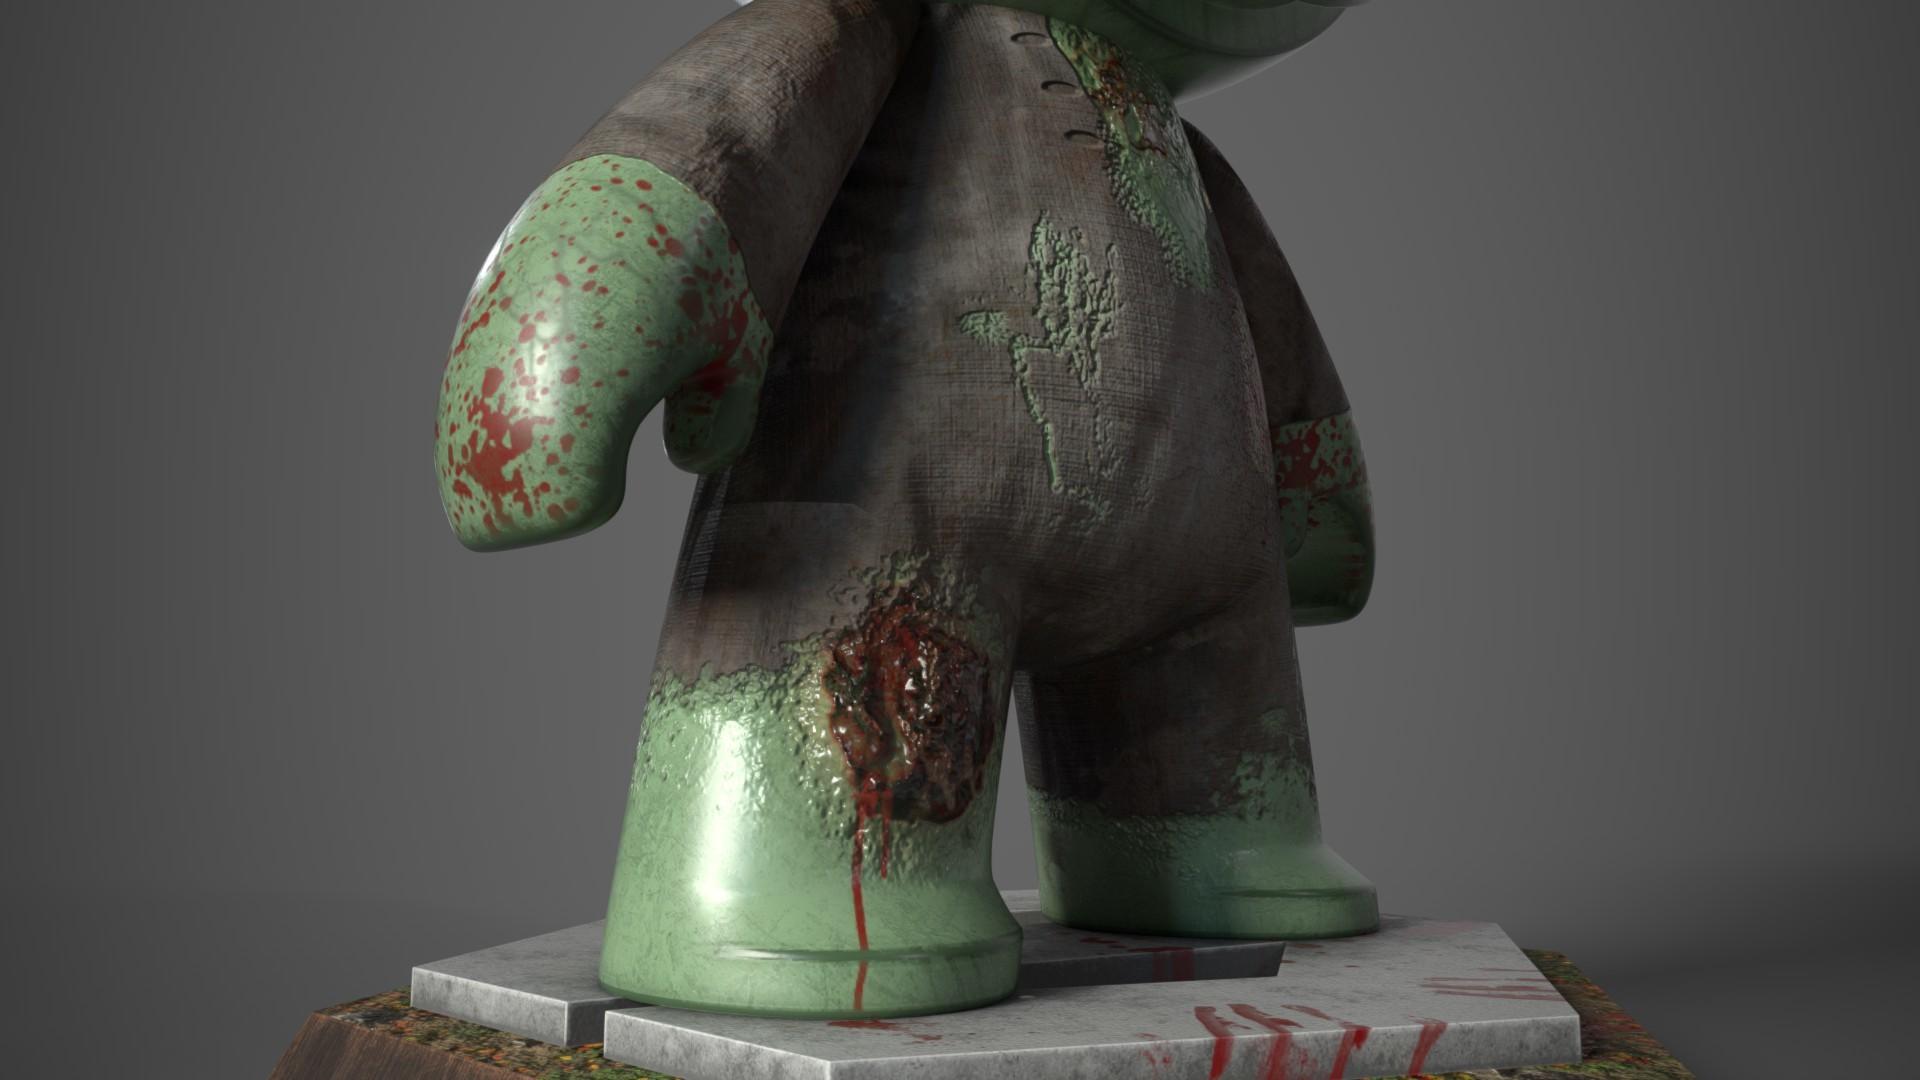 Conor scott zombmat6